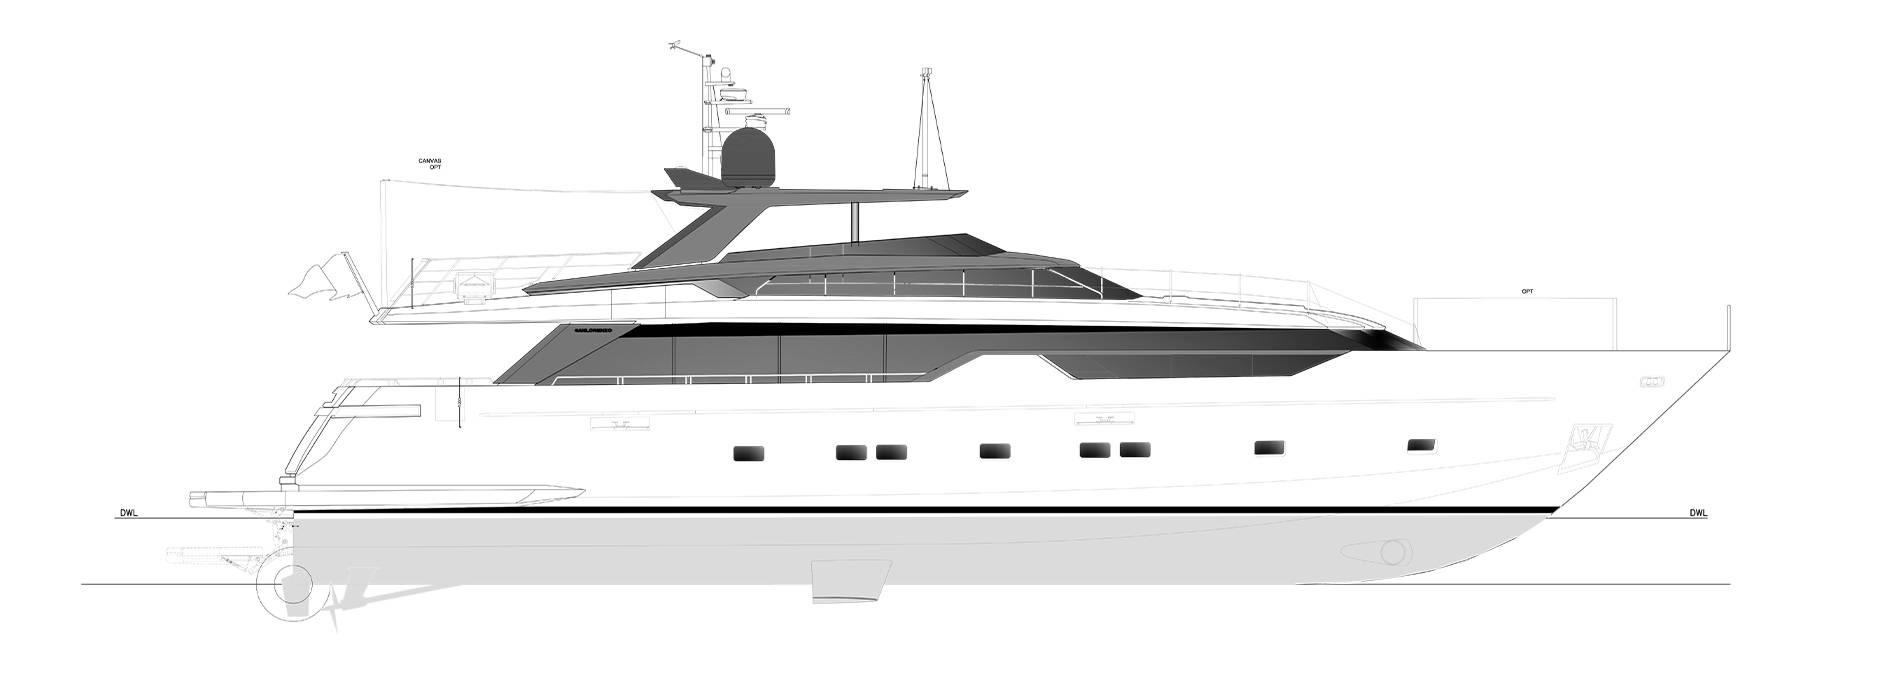 Sanlorenzo Yachts SL102A-746 外观